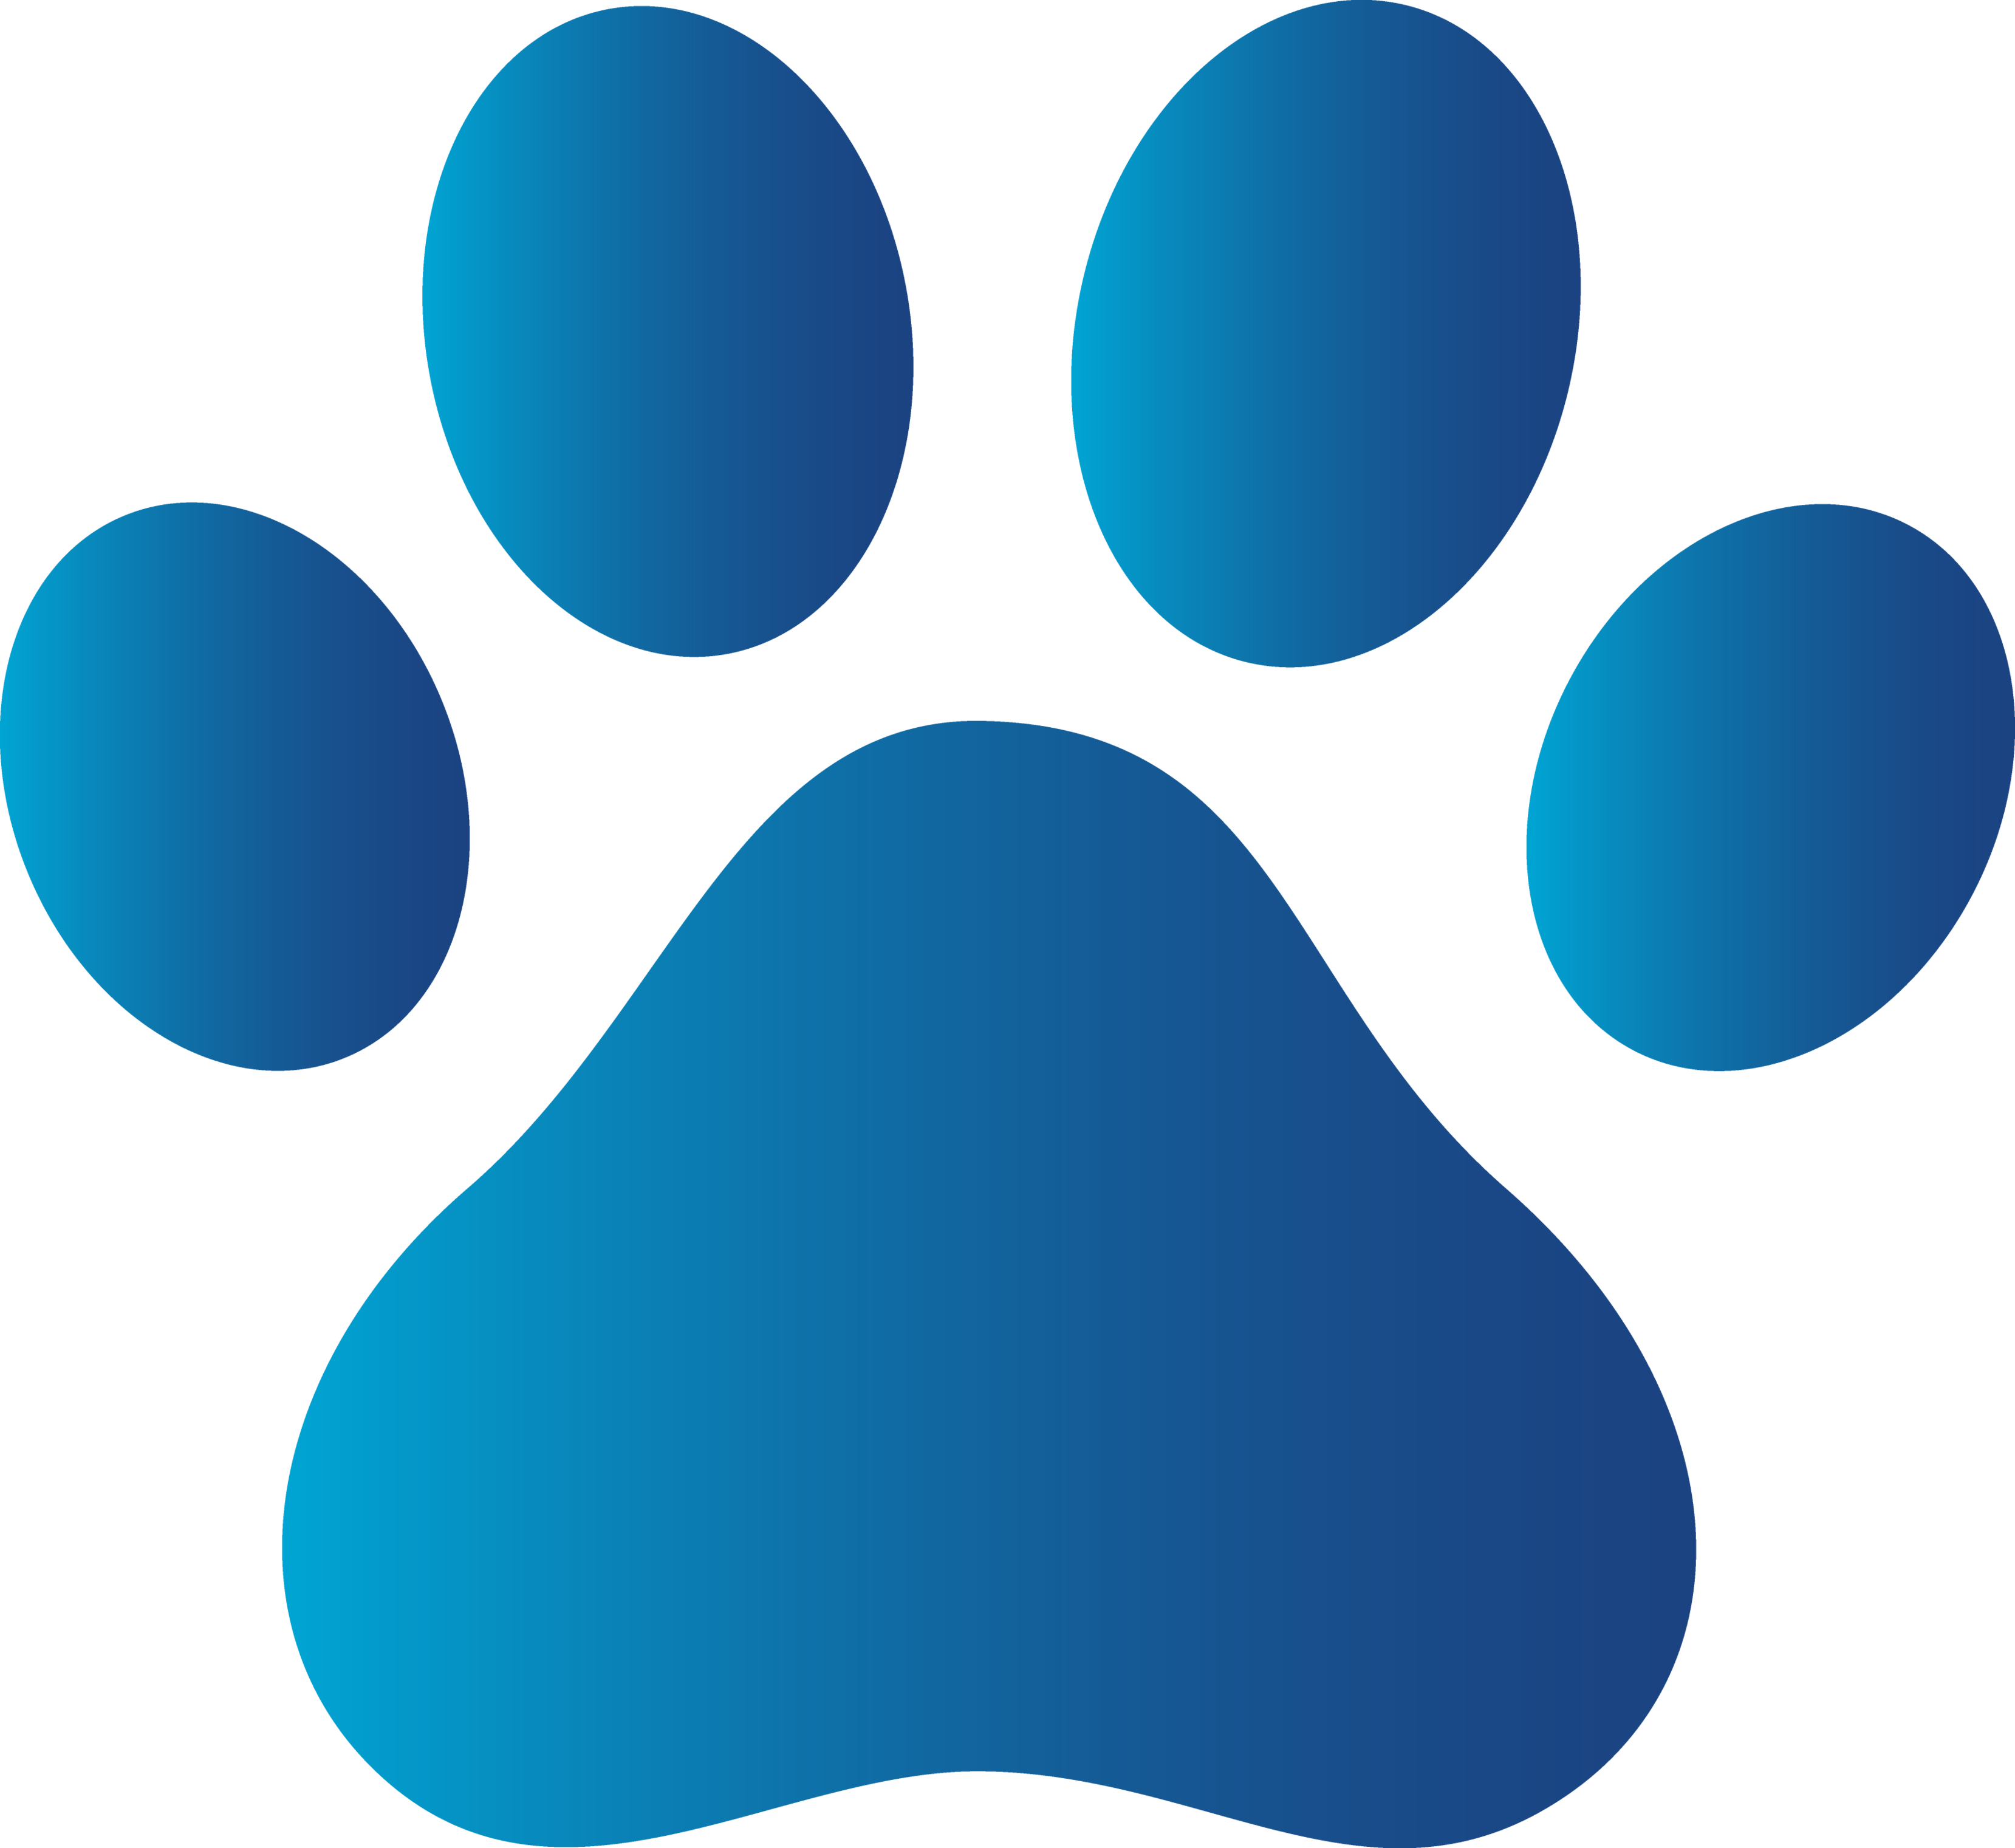 Footprint clipart dog Footprint footprint clipart Dog clipart